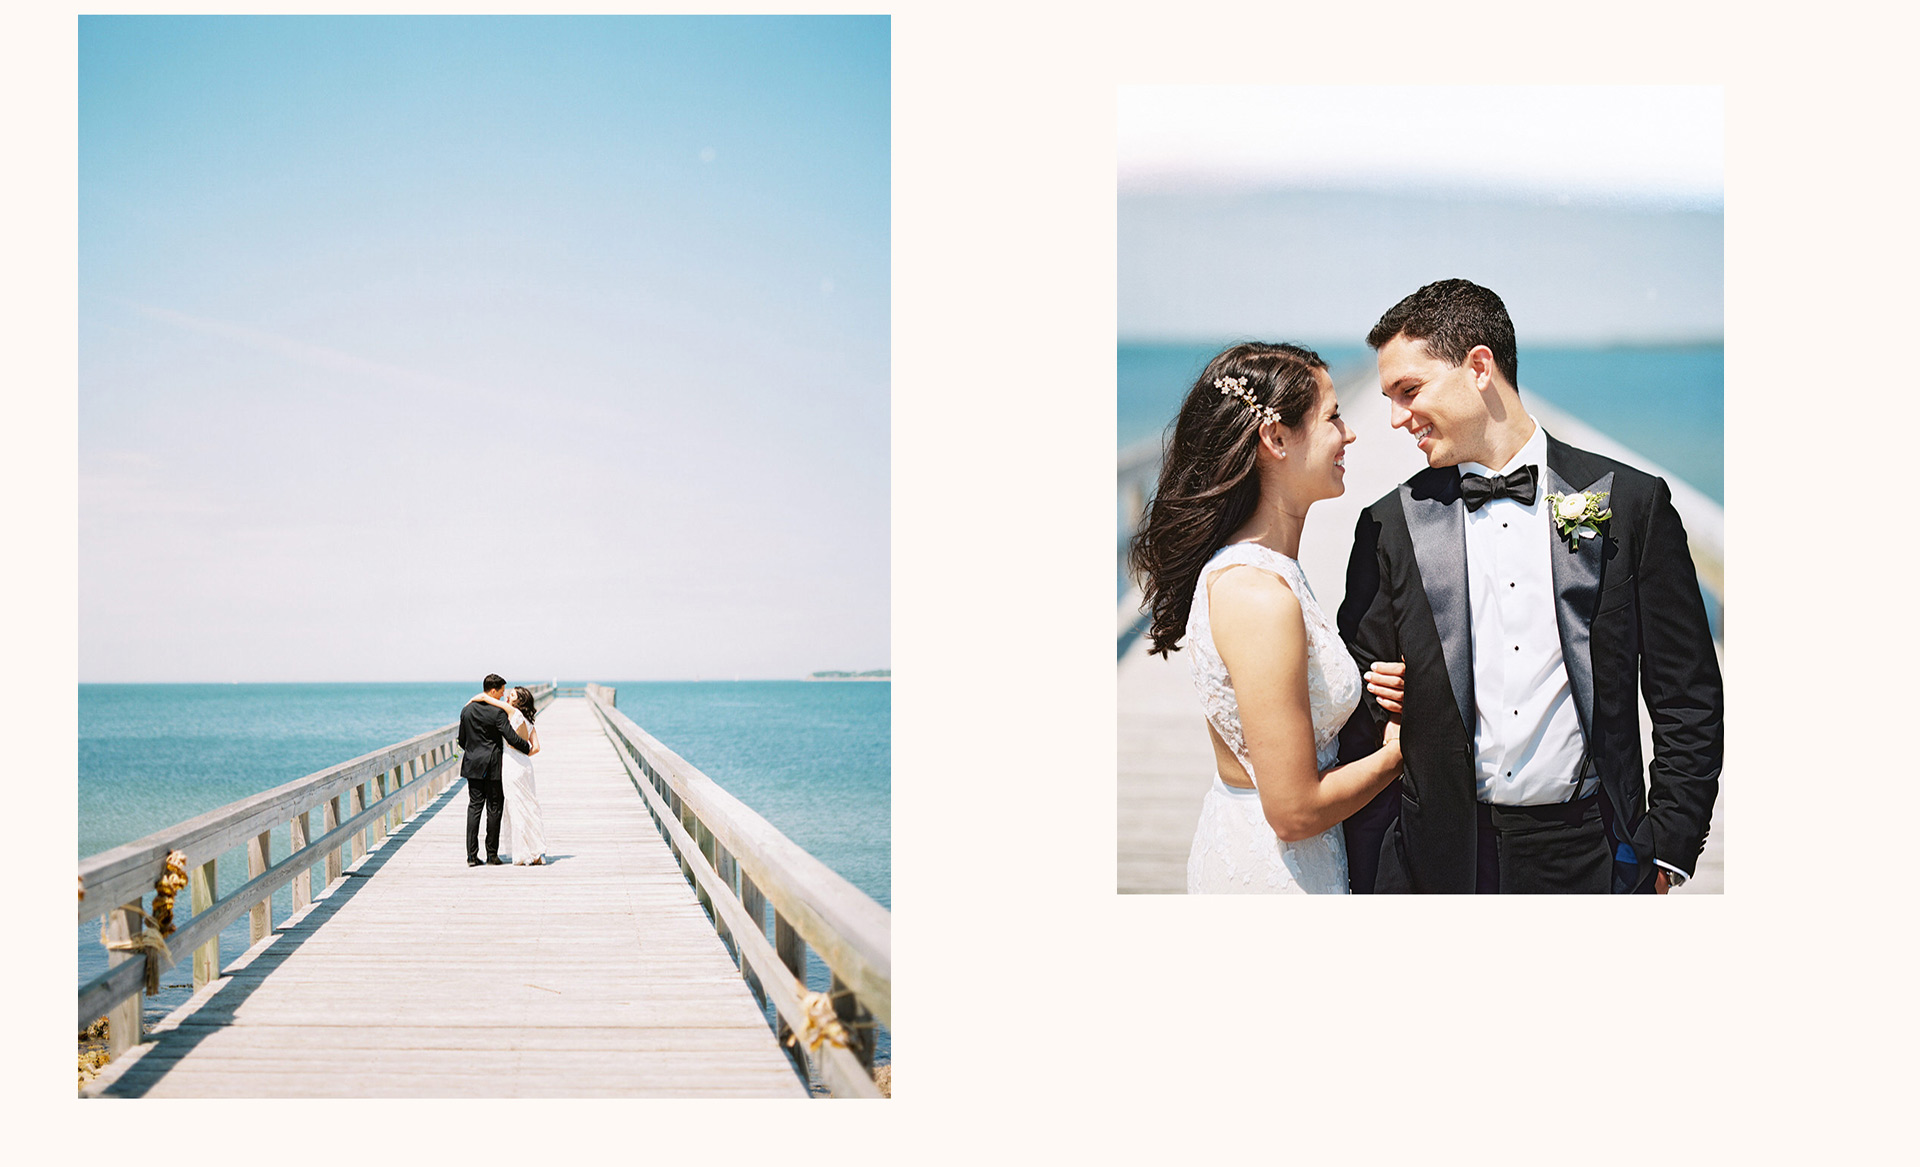 08 montauk wedding photographer - GURNEYS WEDDING - MONTAUK, NY